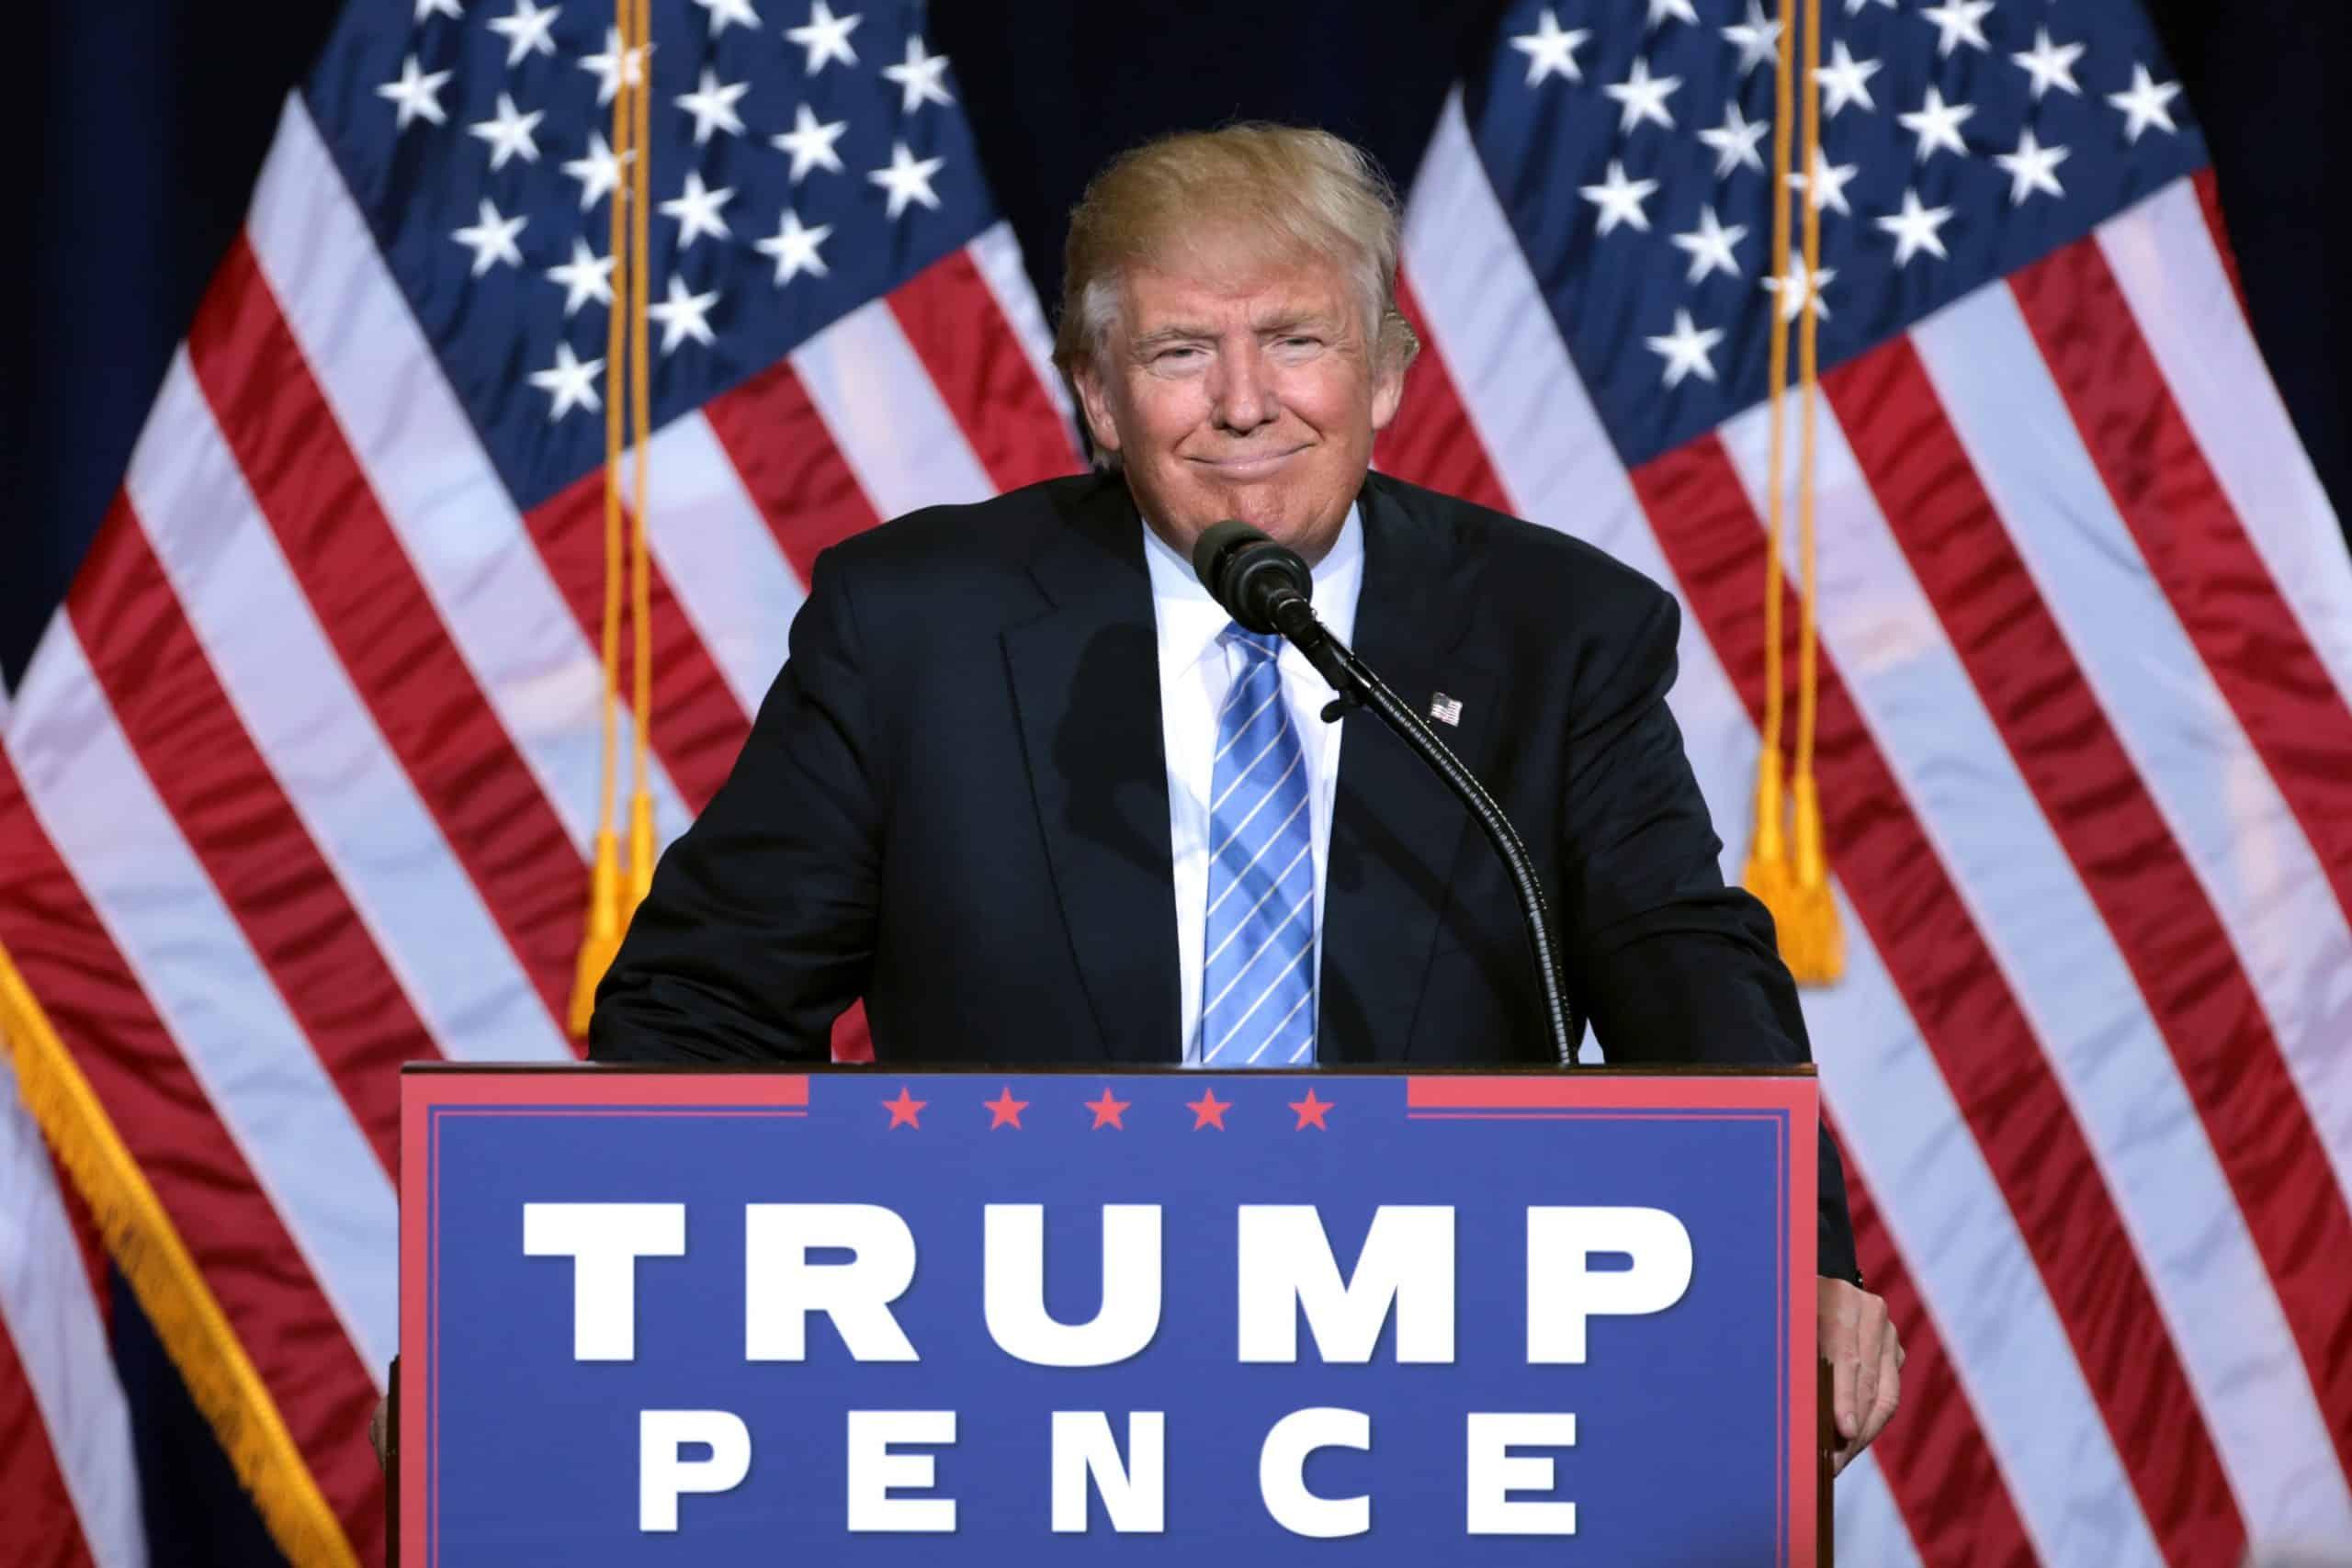 президент сша дональд трамп фото